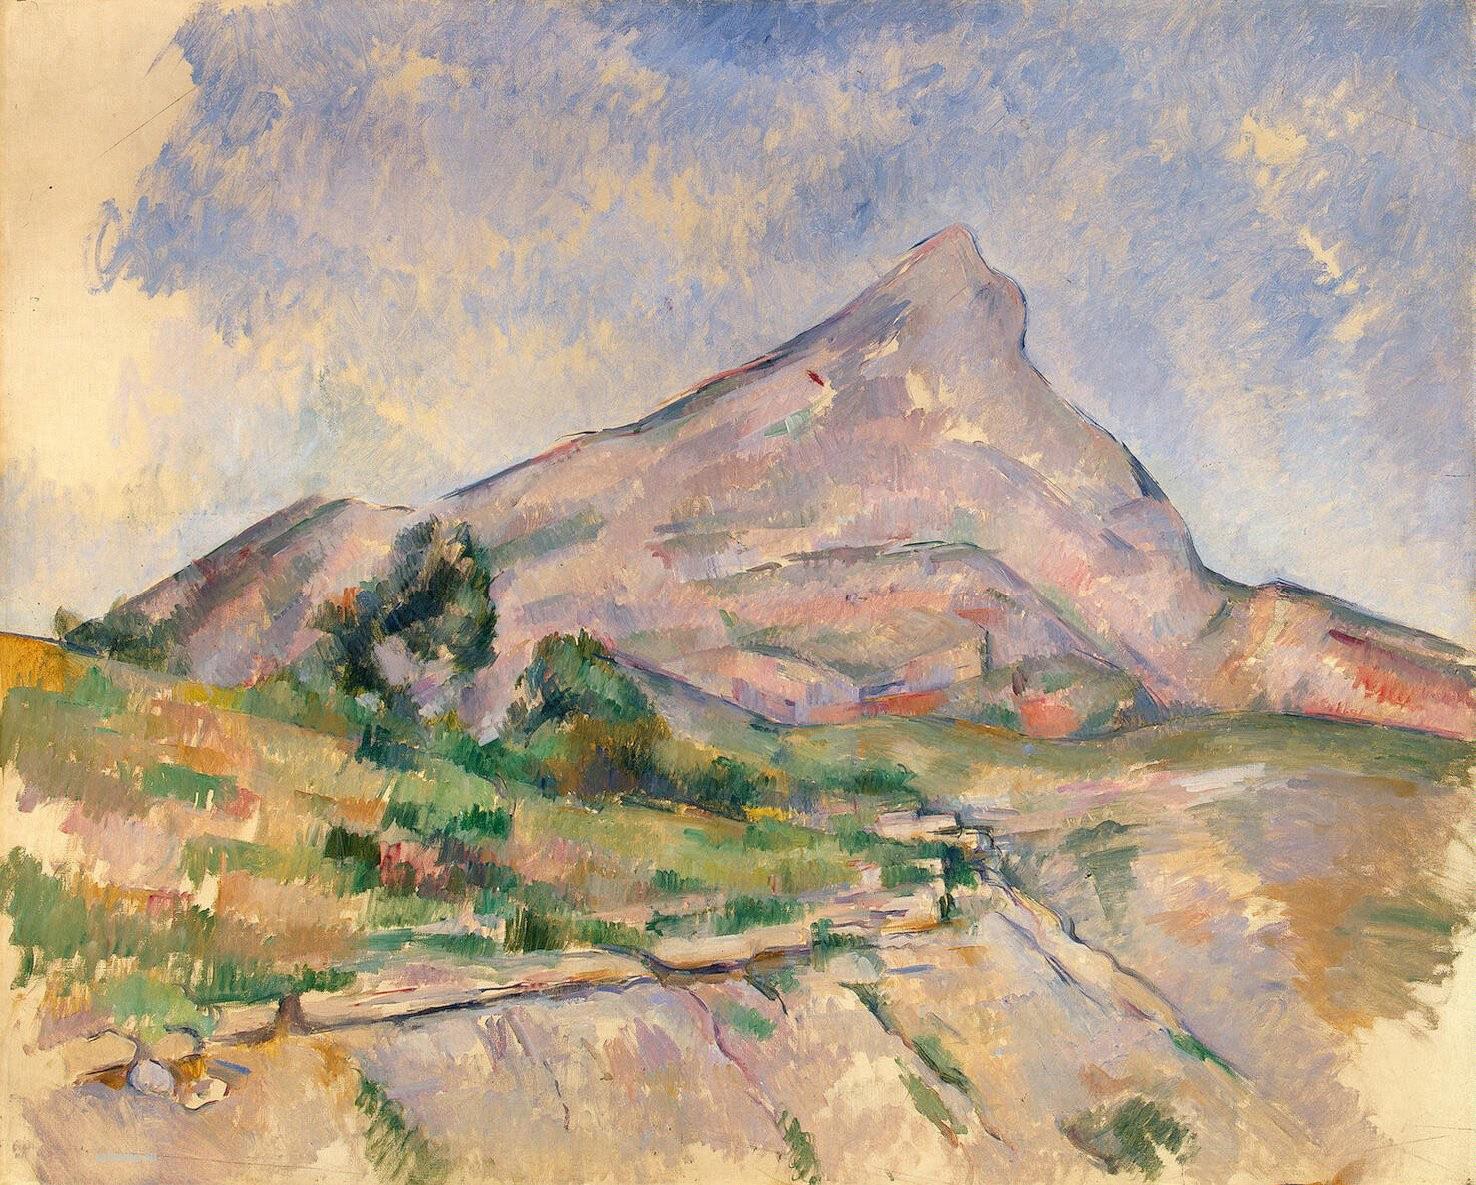 Сезанн картина Sainte Victoire Эрмитаж пейзажи природы Сафиуллин